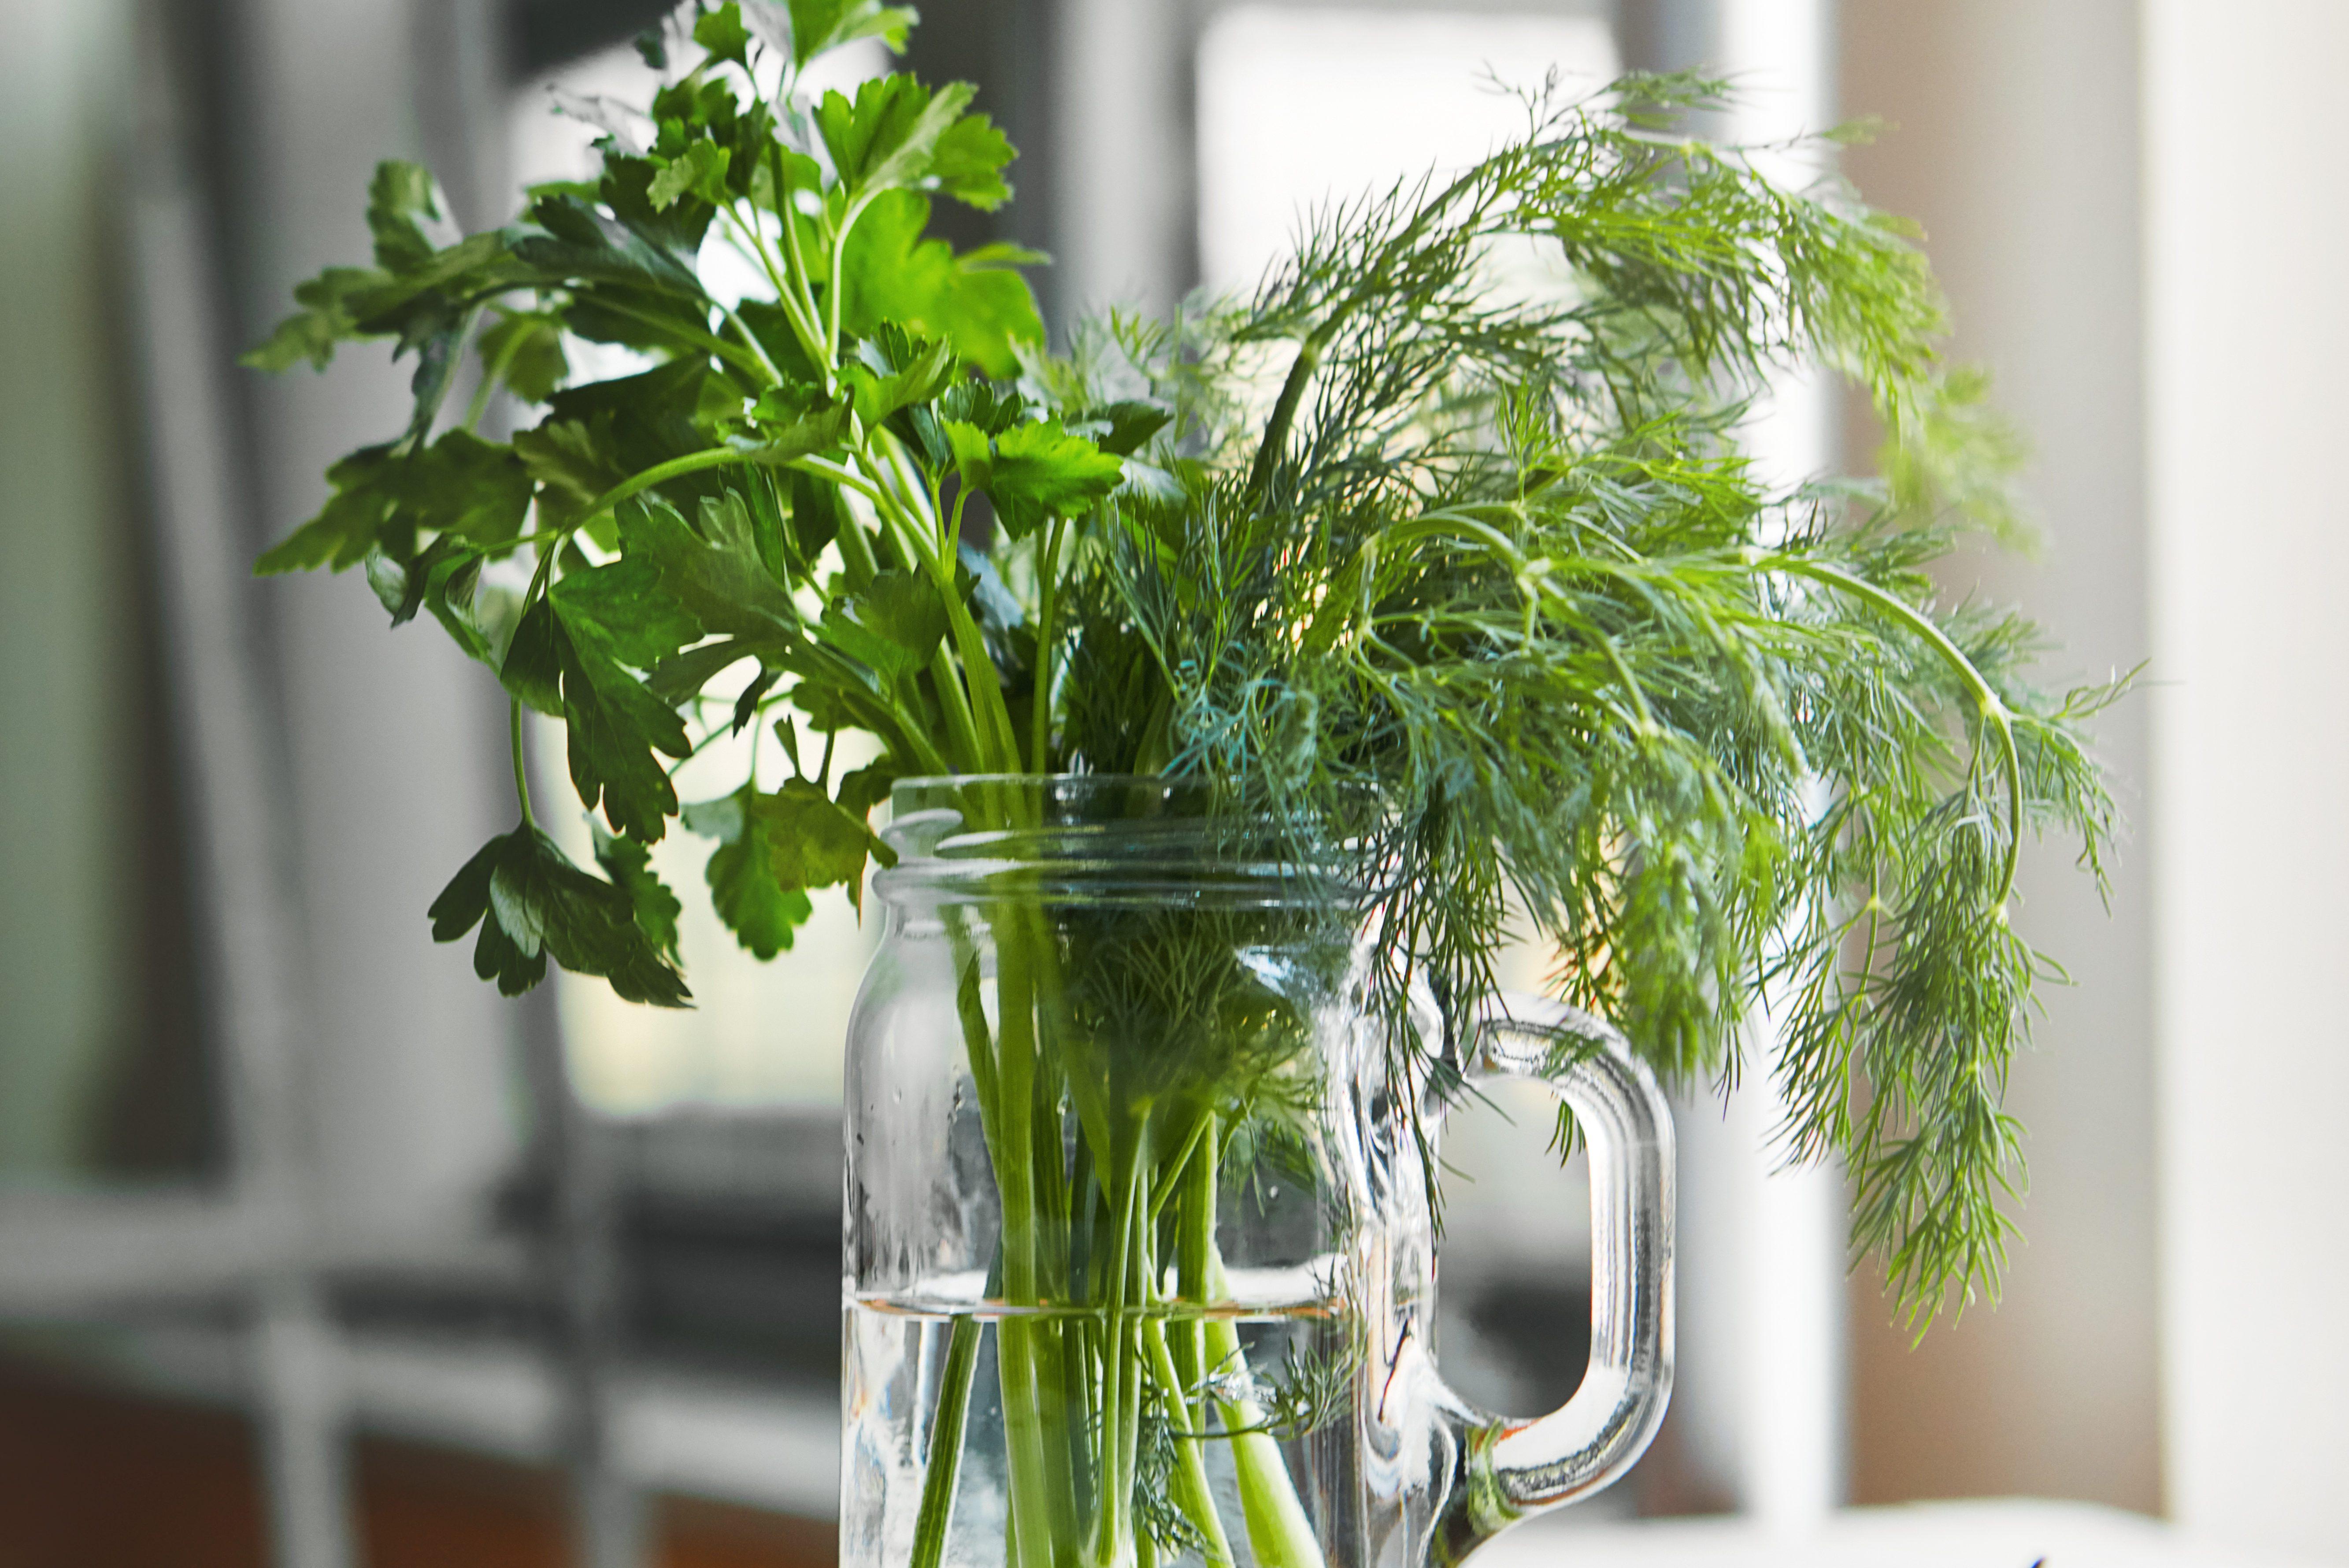 Bringing the garden into the kitchen